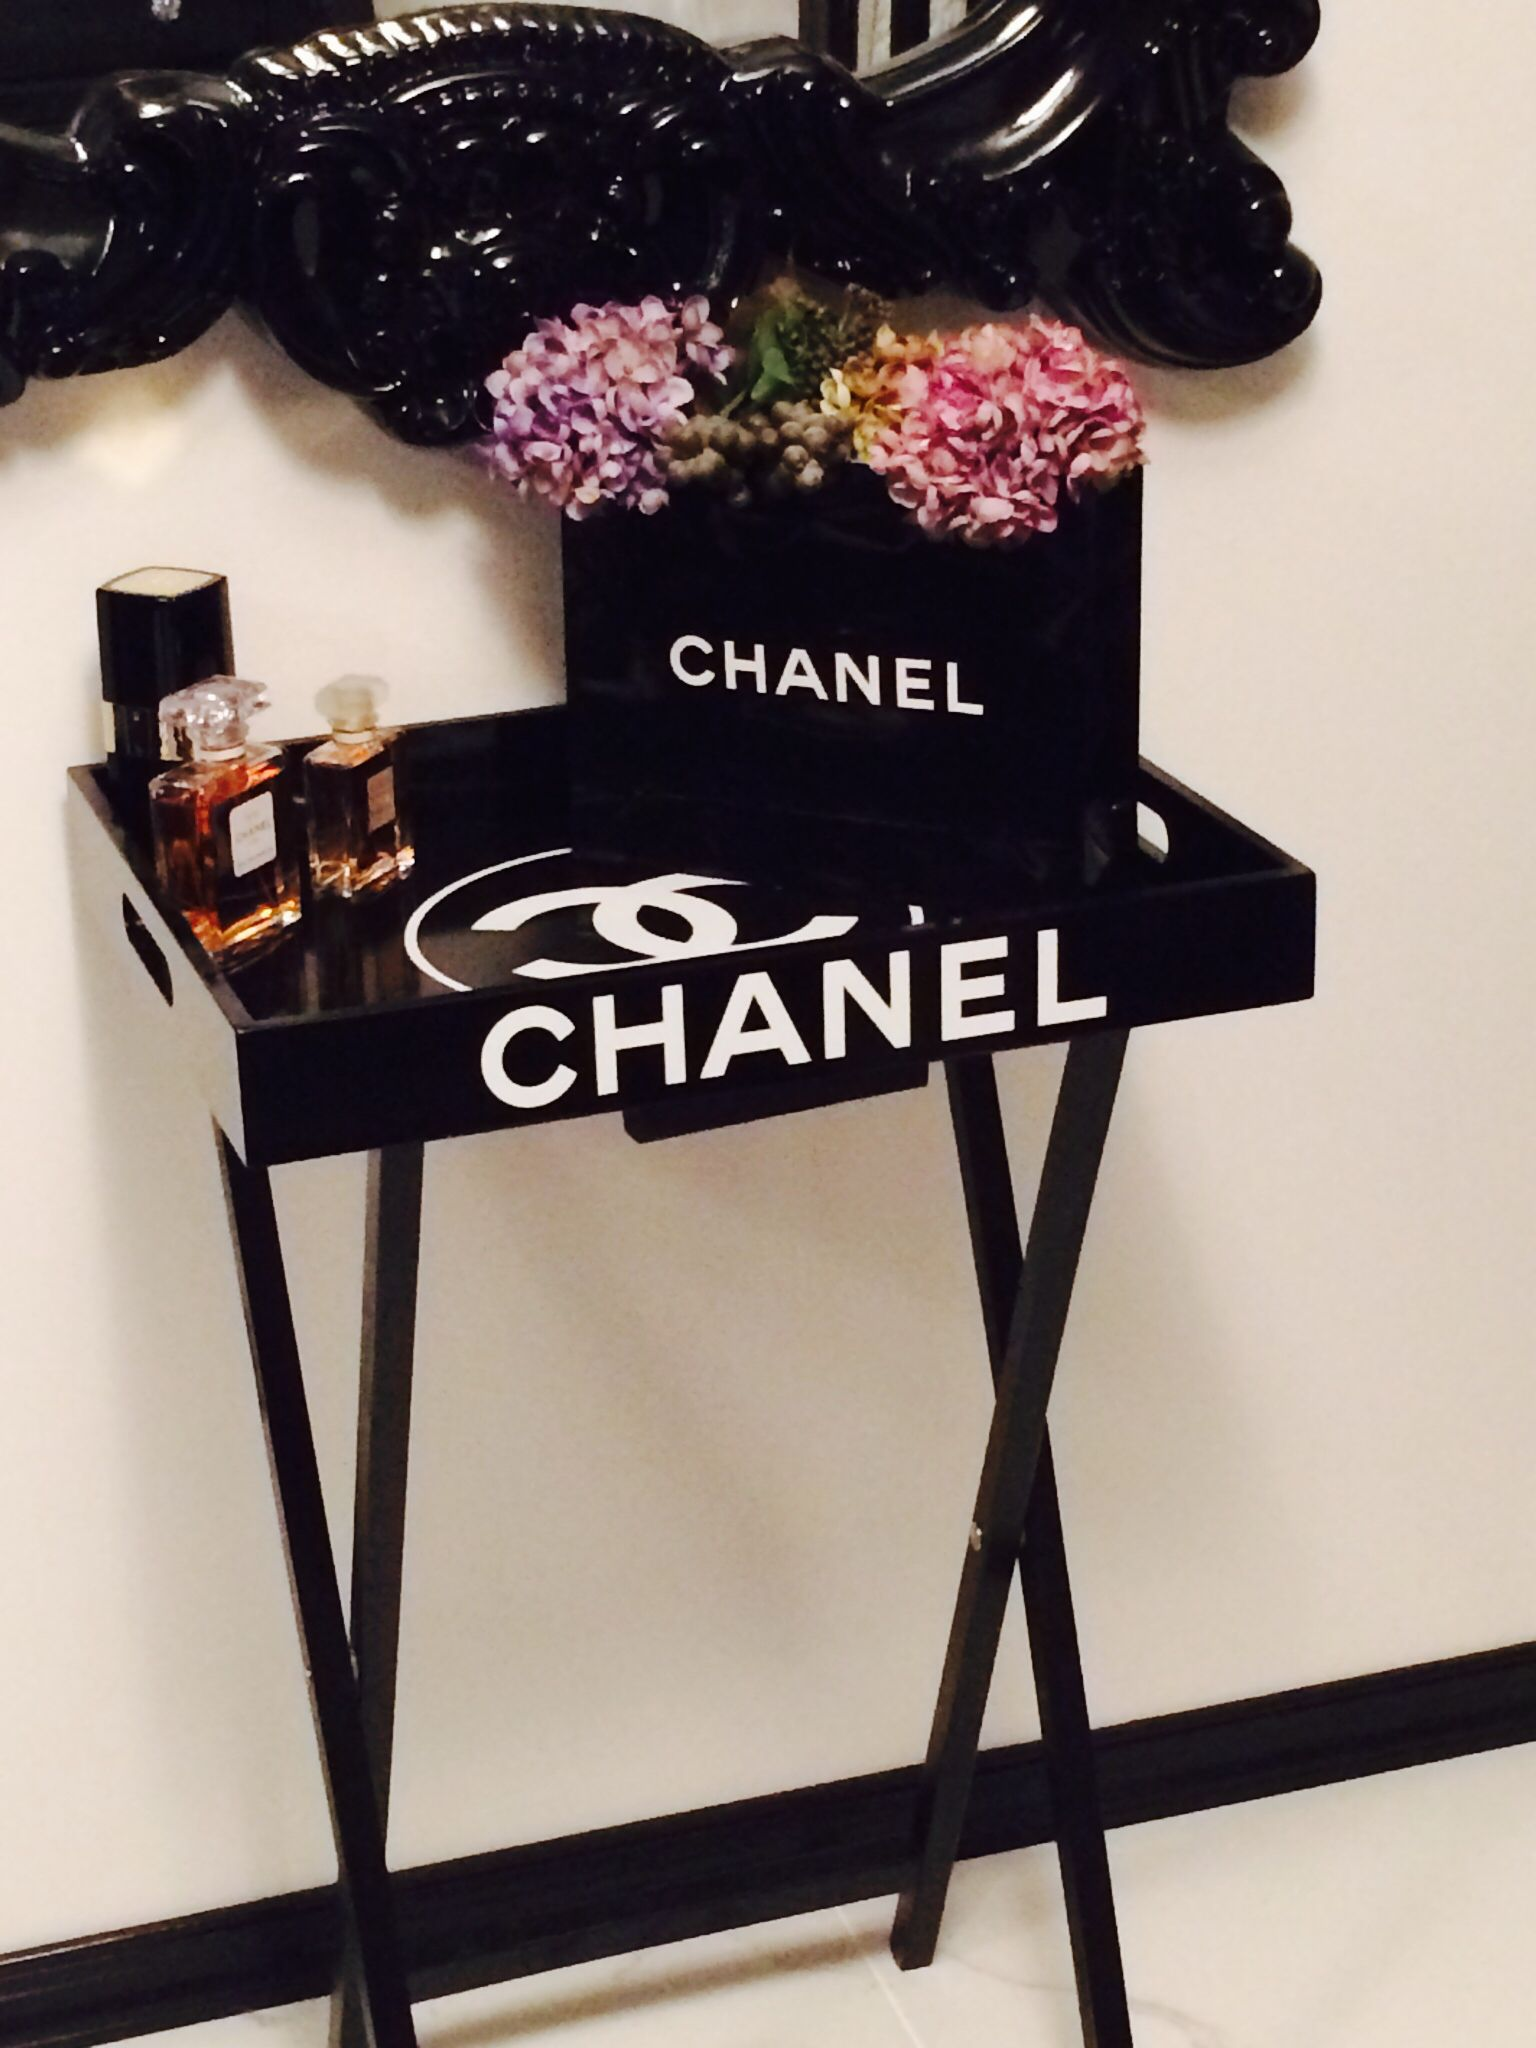 Verwonderend Chanel Table Chanel Bag Perfume | Chanel bedroom, Chanel room MK-67